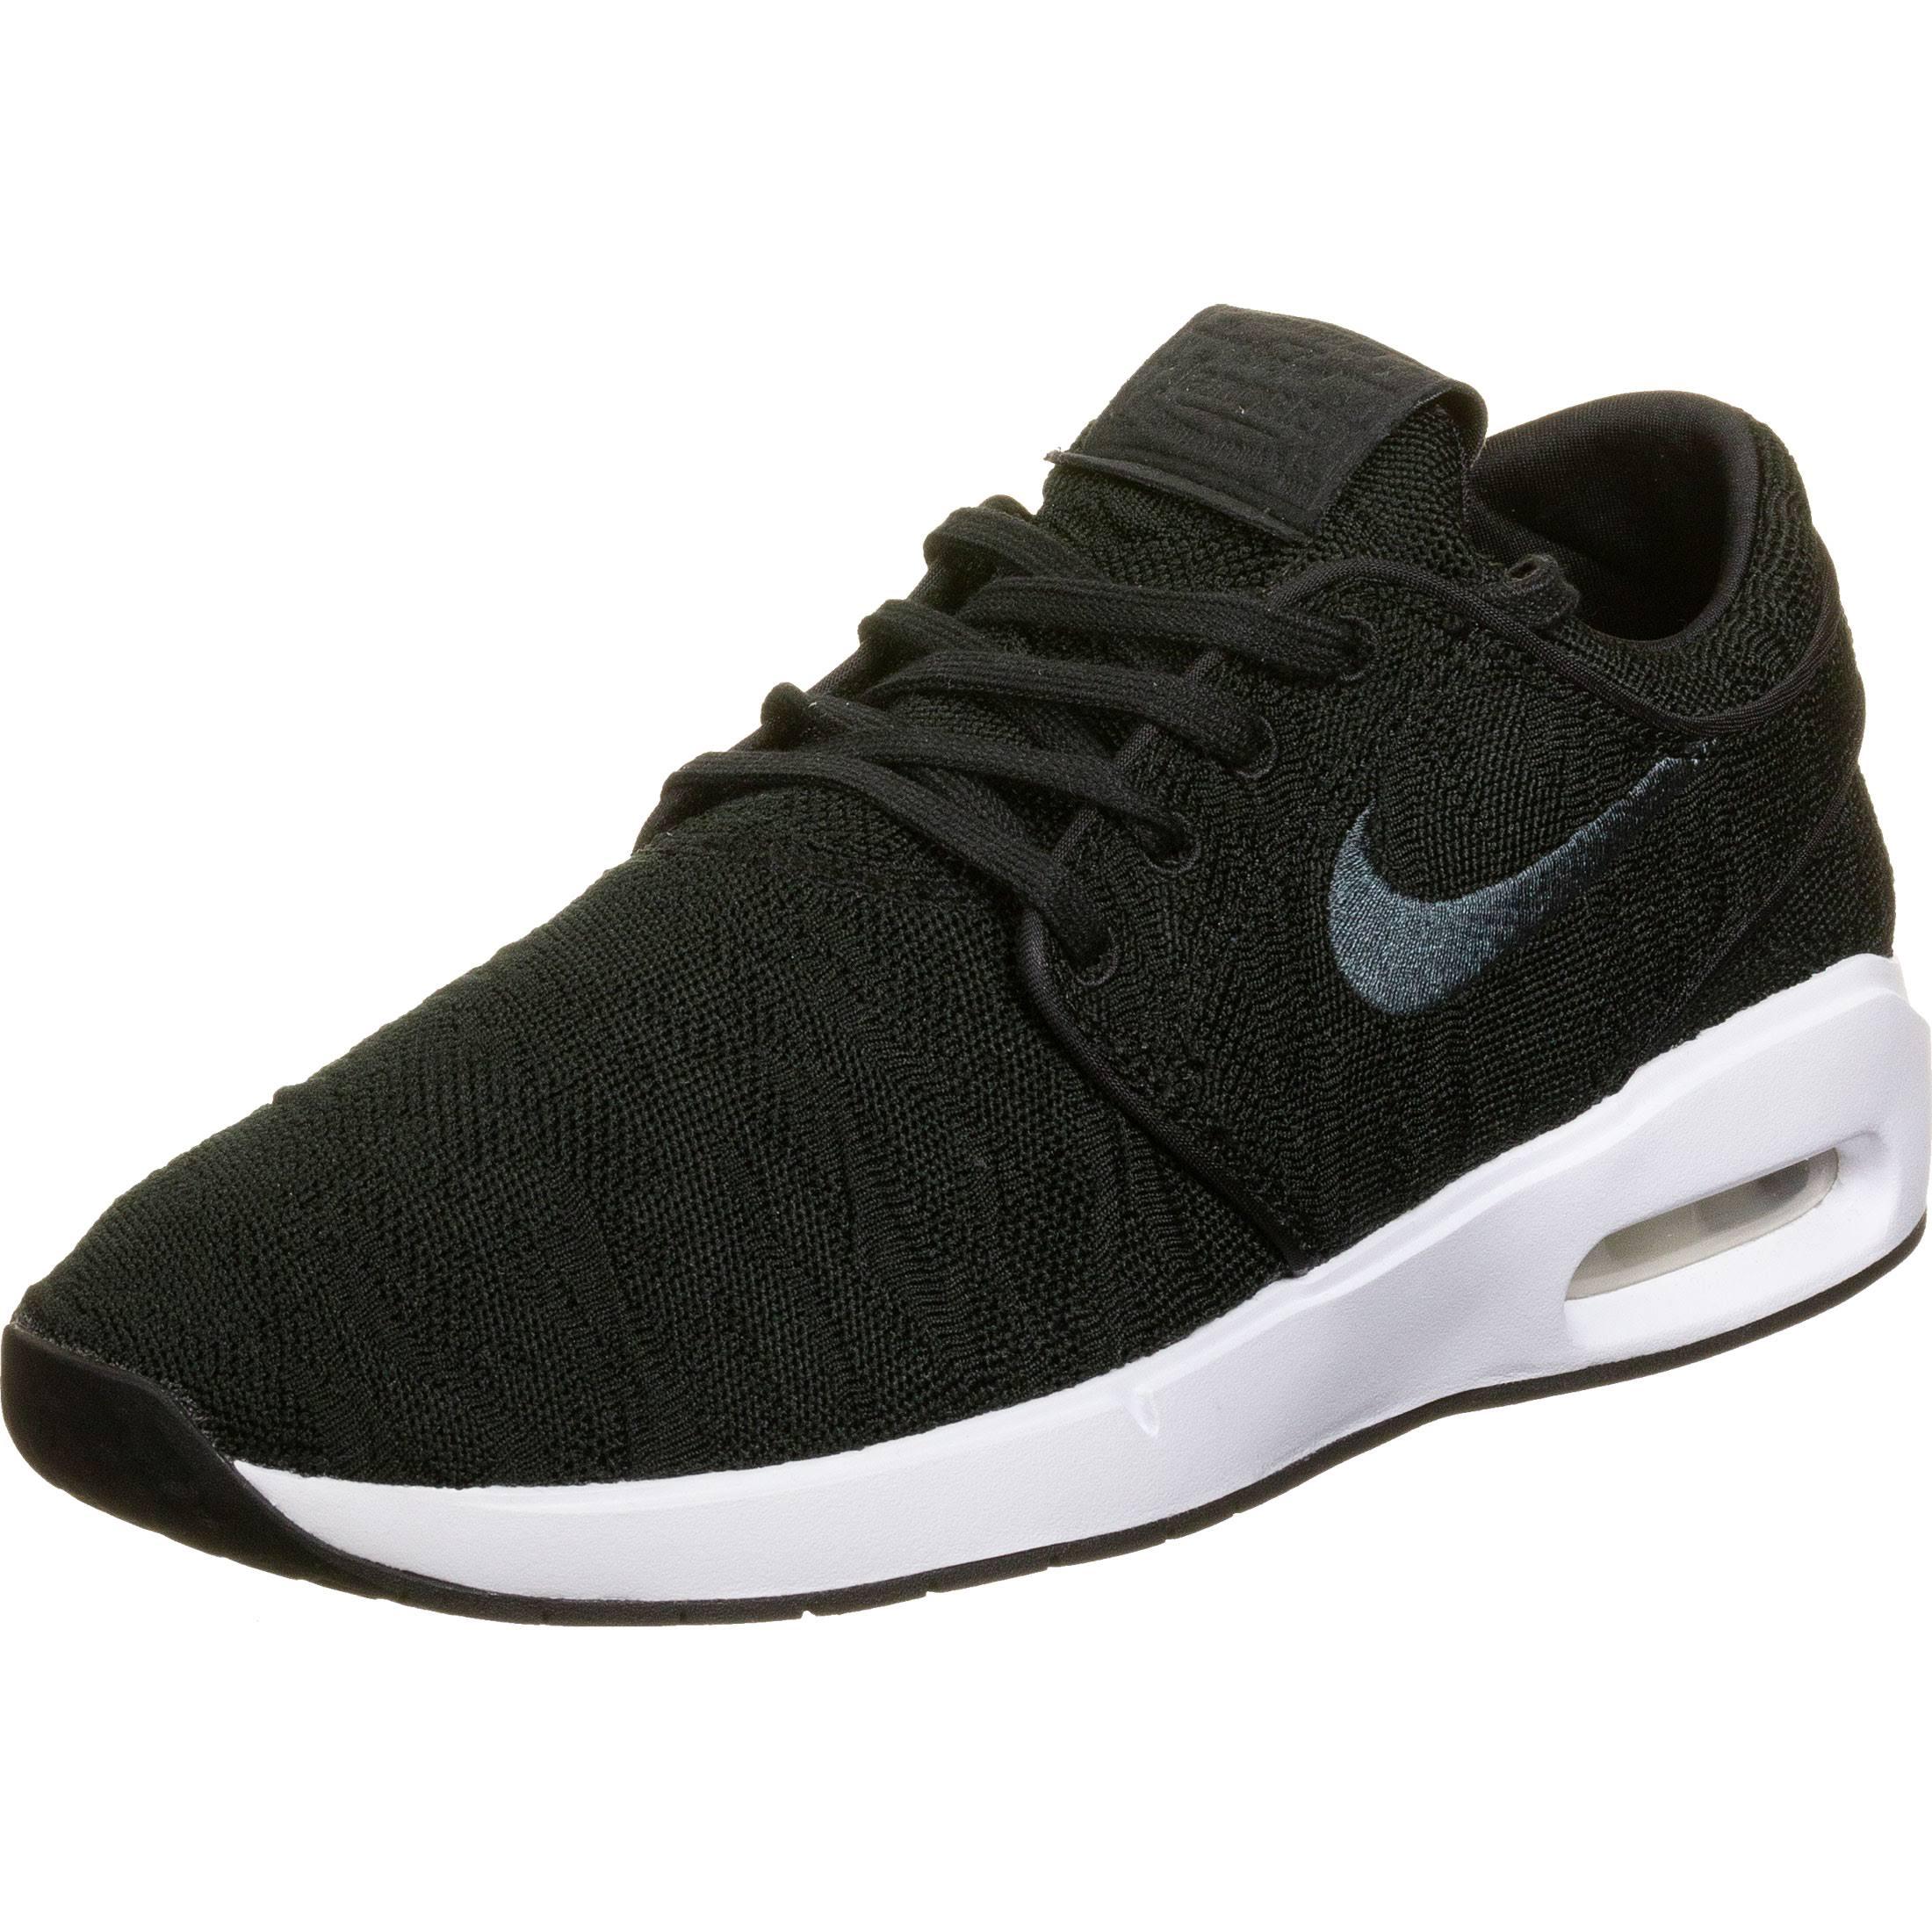 Nike SB Air Max Janoski 2 Black White  22MsdPy